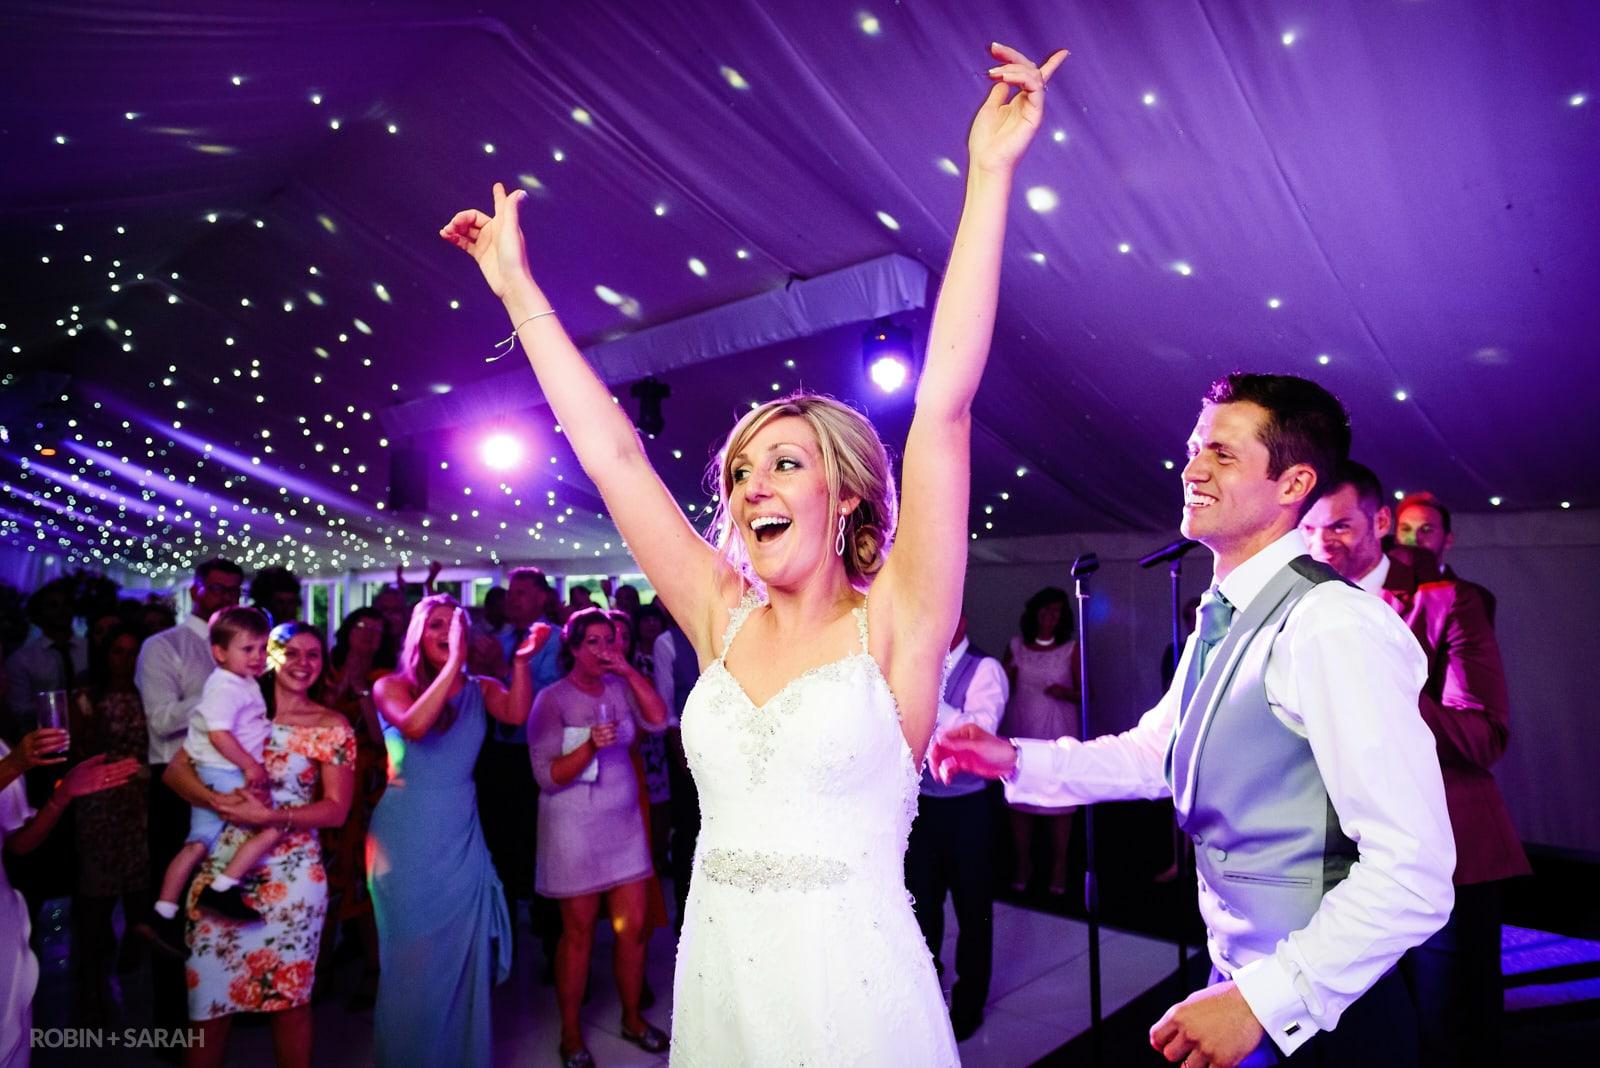 Bride raises her hands on dancefloor as guests watch and laugh